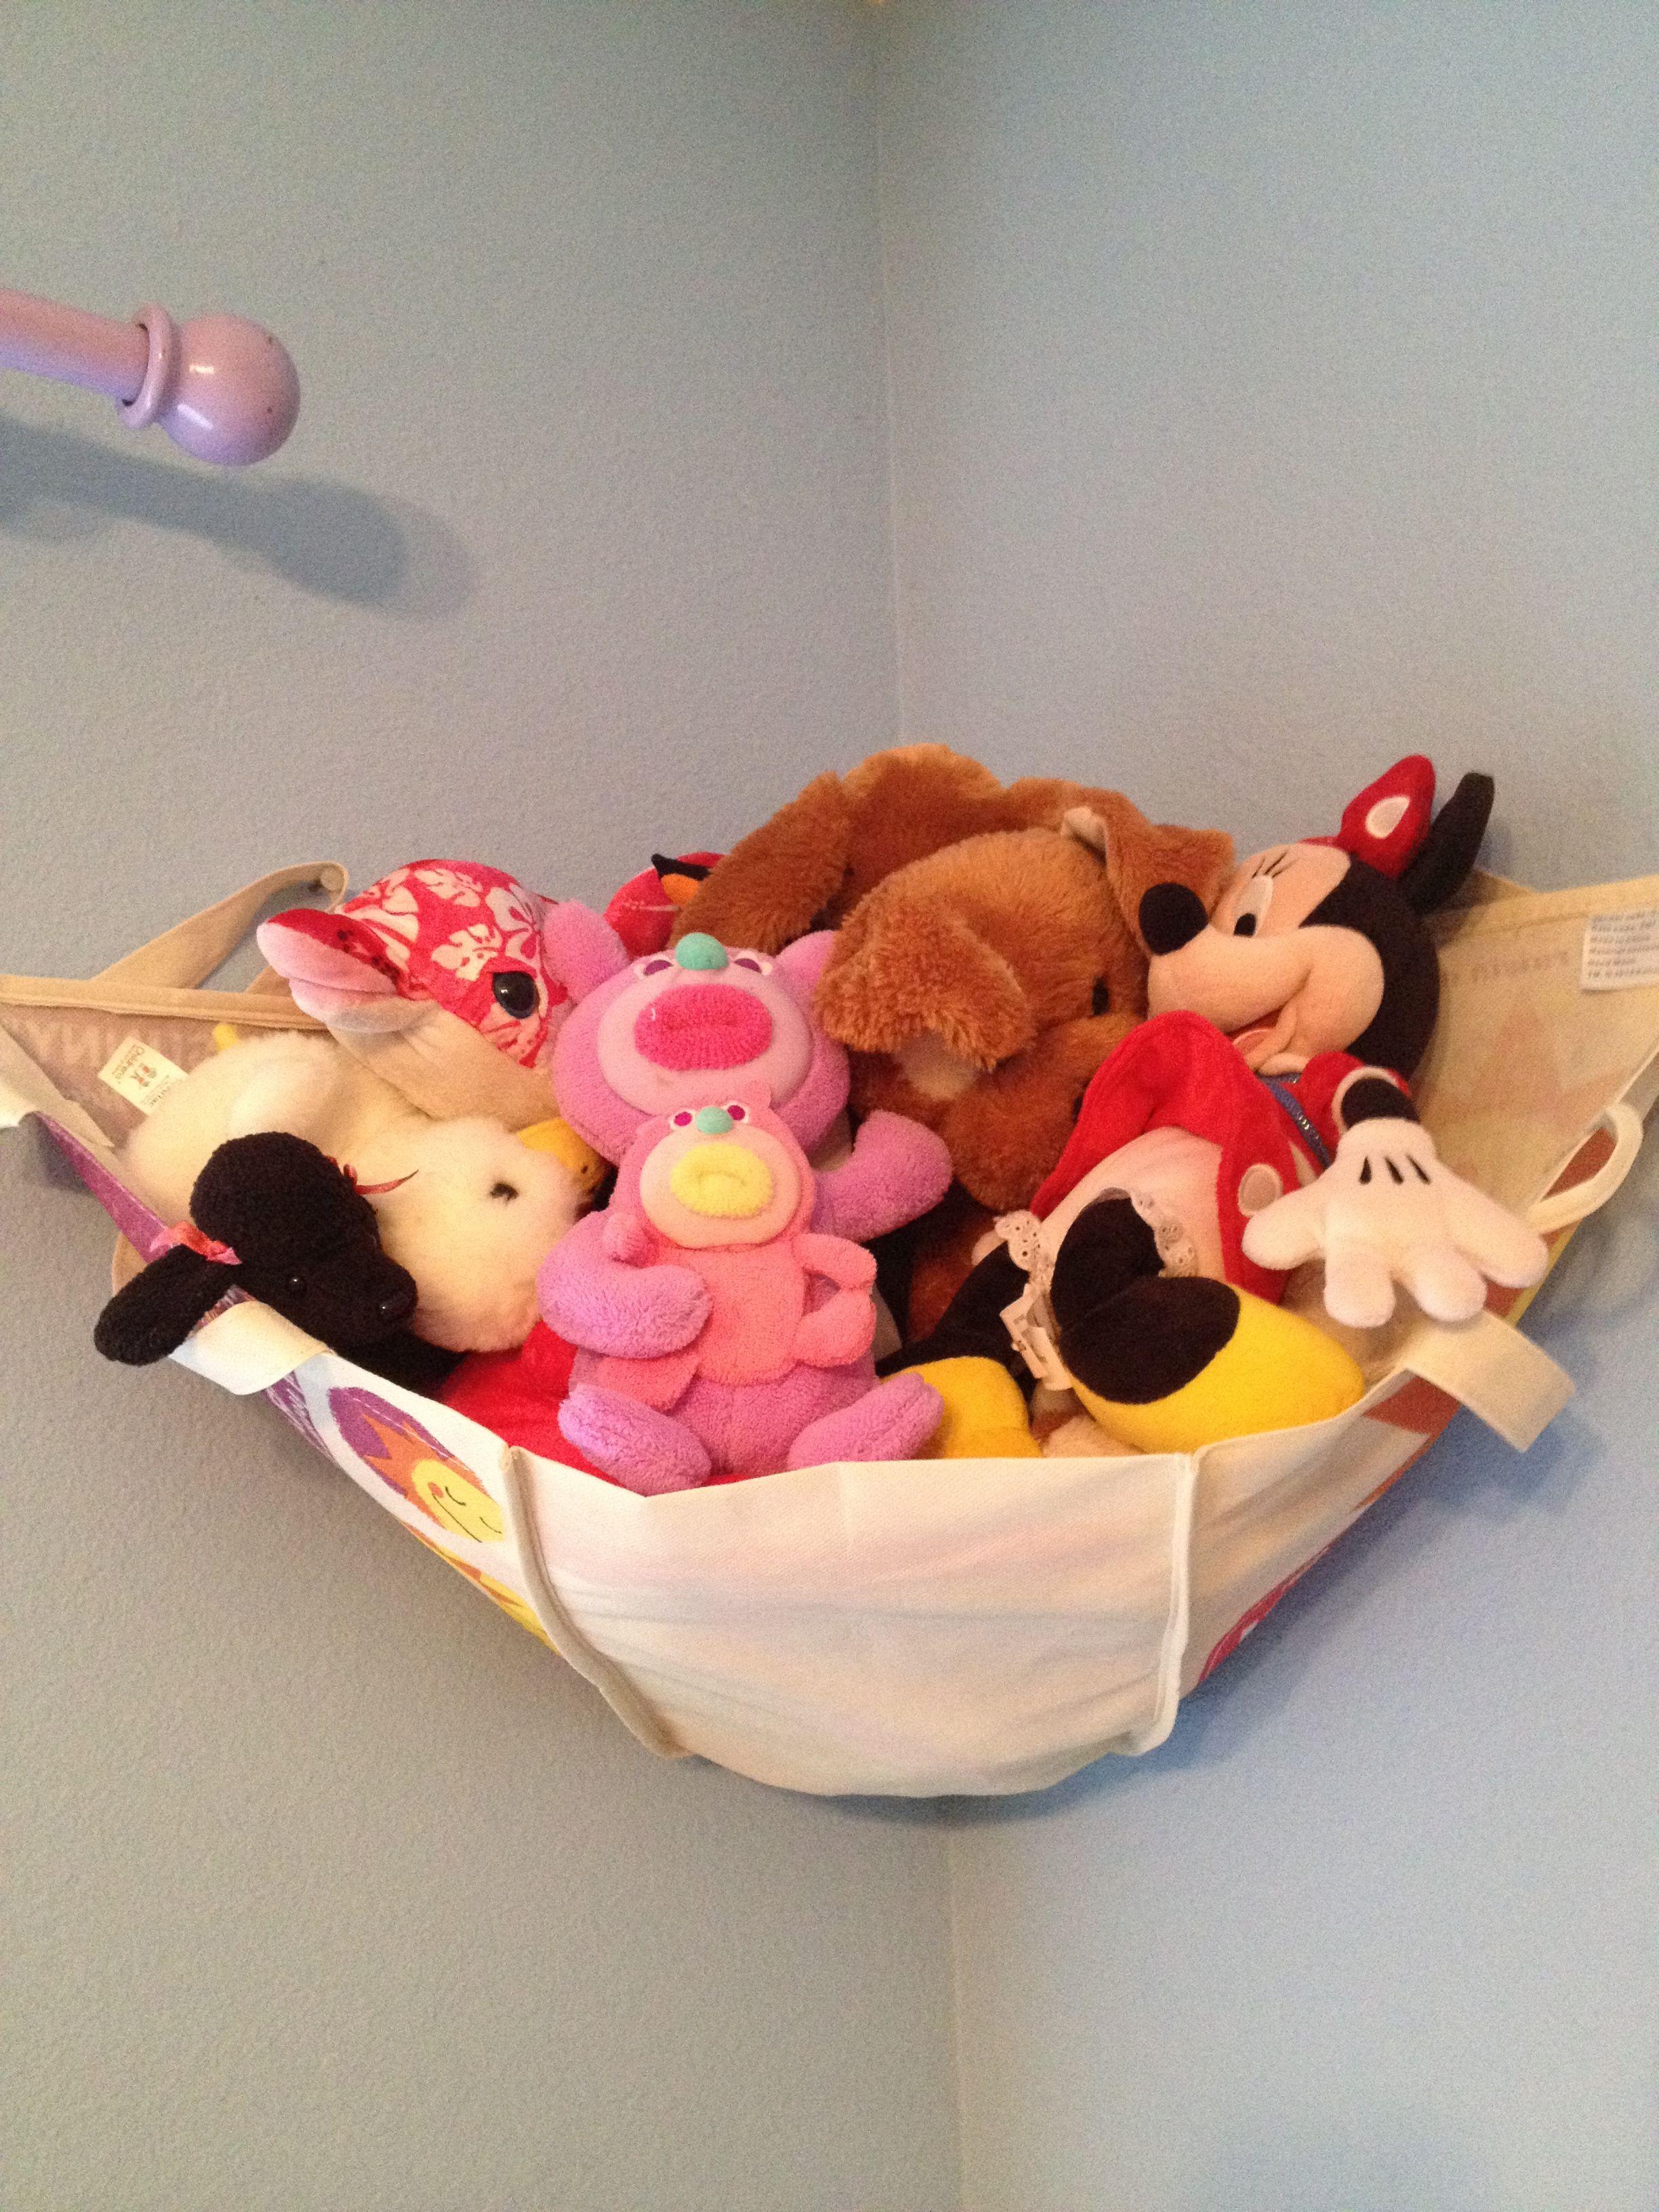 Diy No Sew Stuffed Animal Hammock Made From A Tote Bag